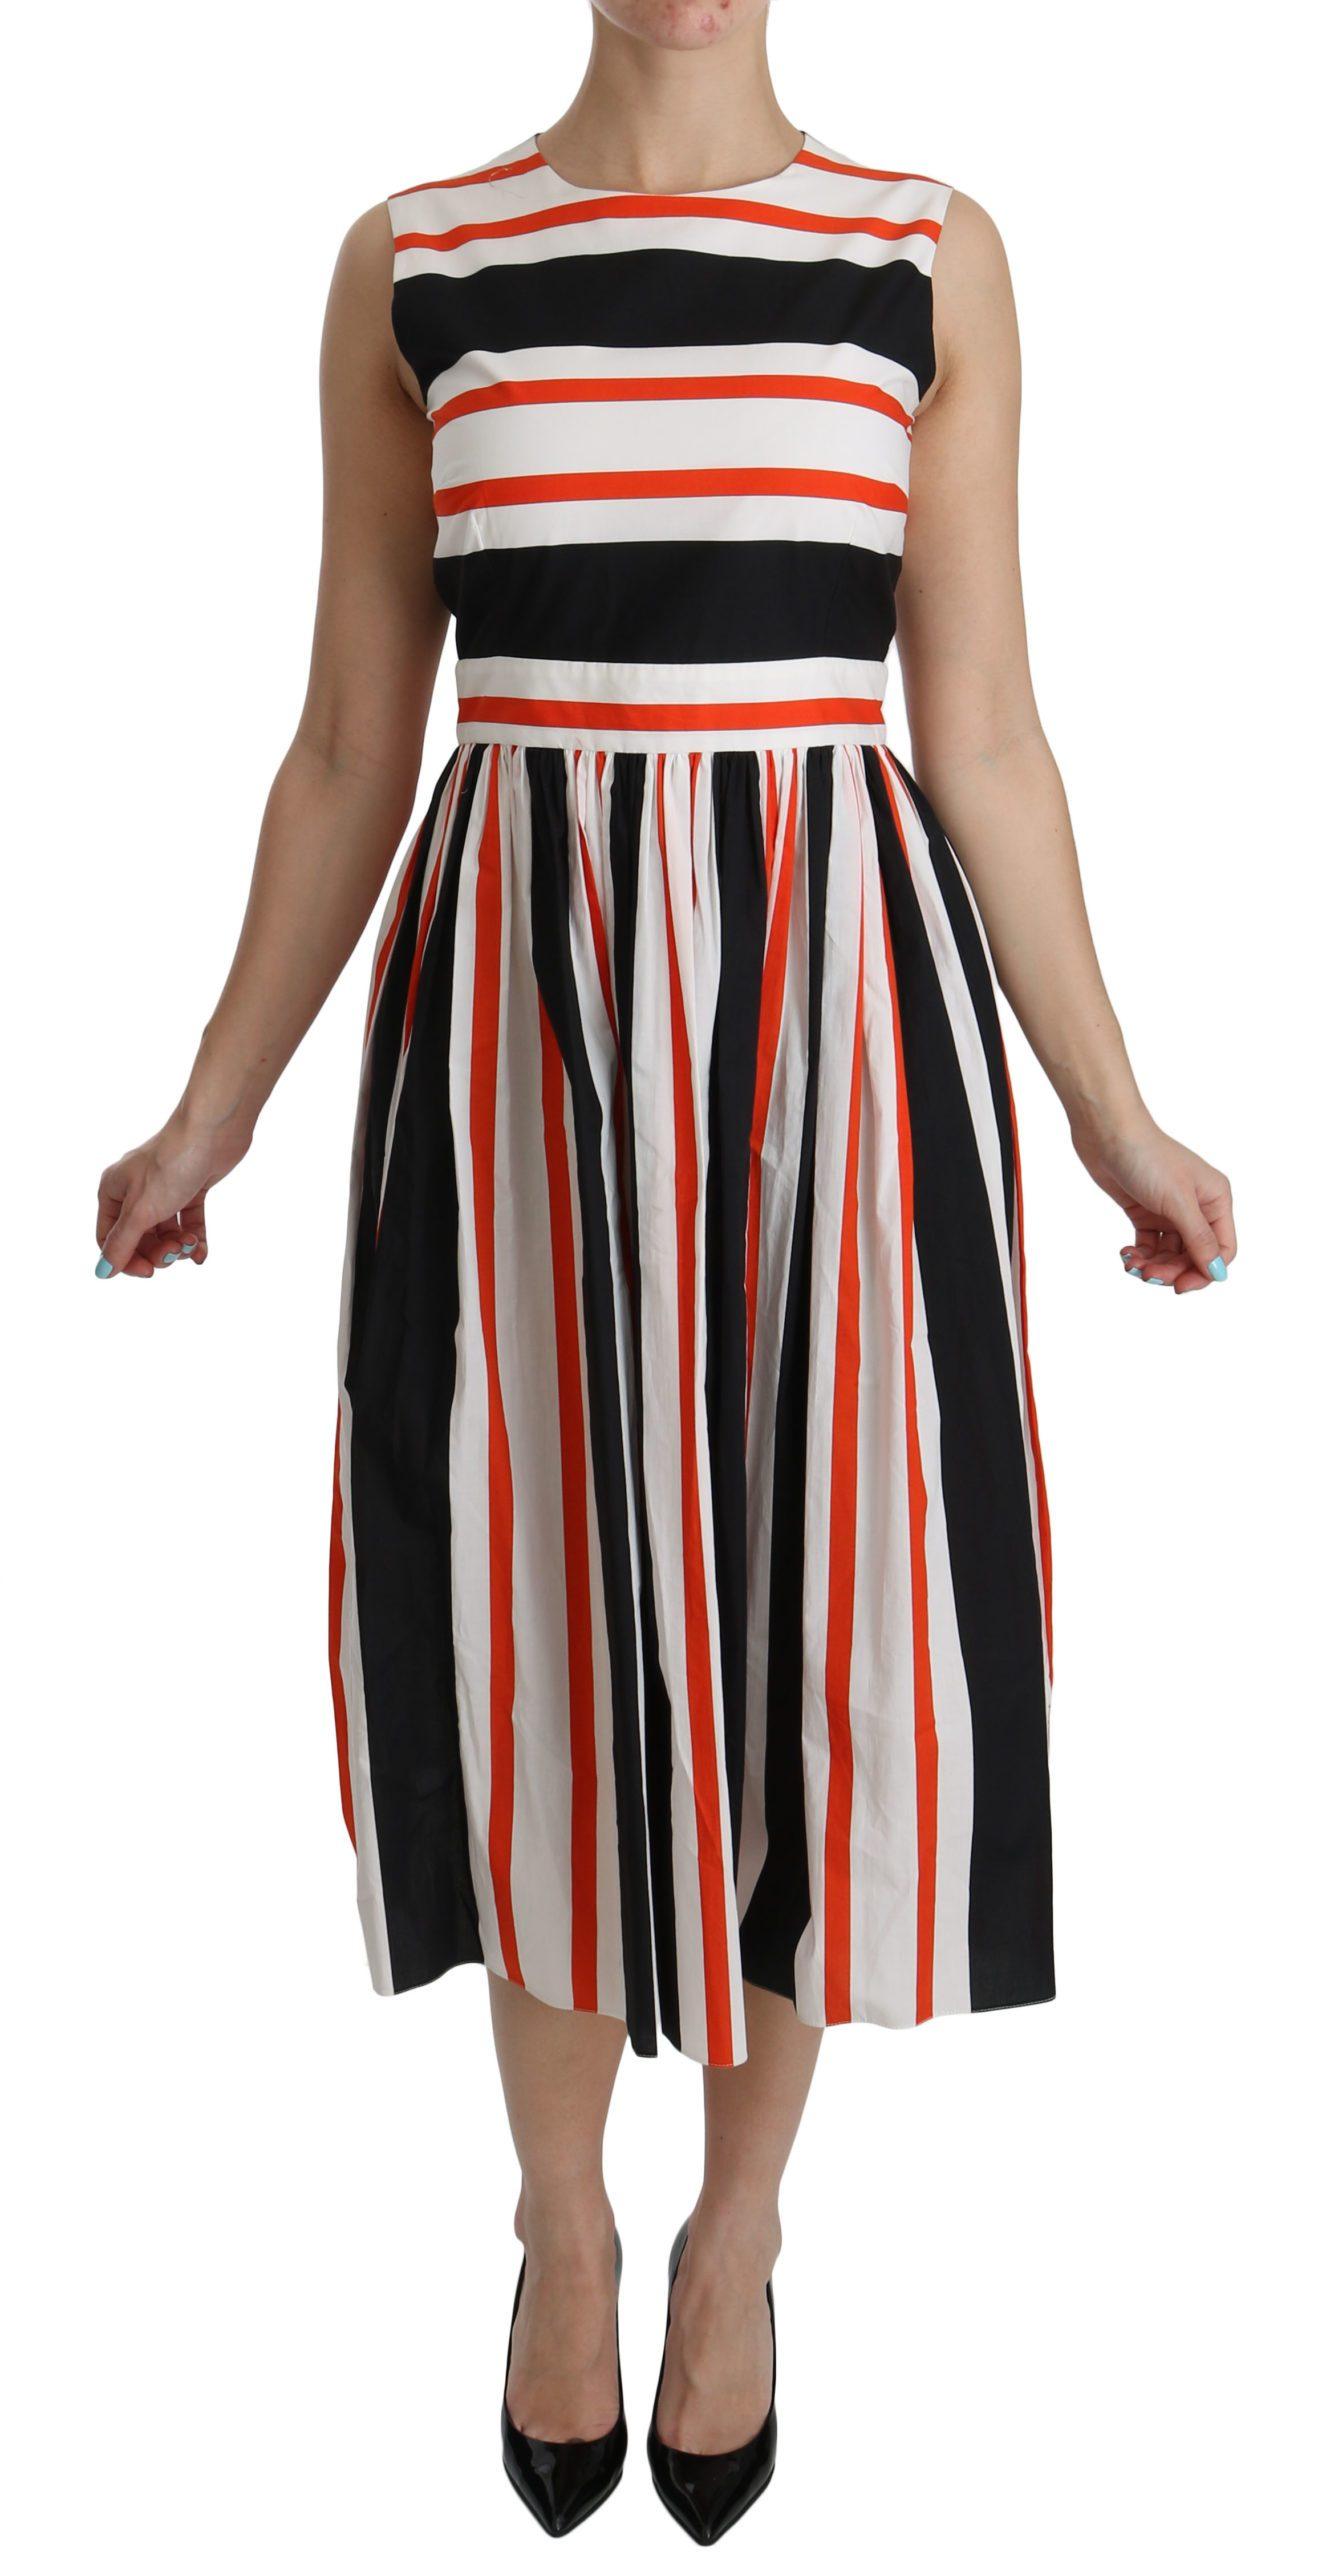 Dolce & Gabbana Women's Stripes A-Line Pleated Midi Dress Multicolor DR2080 - IT44|L